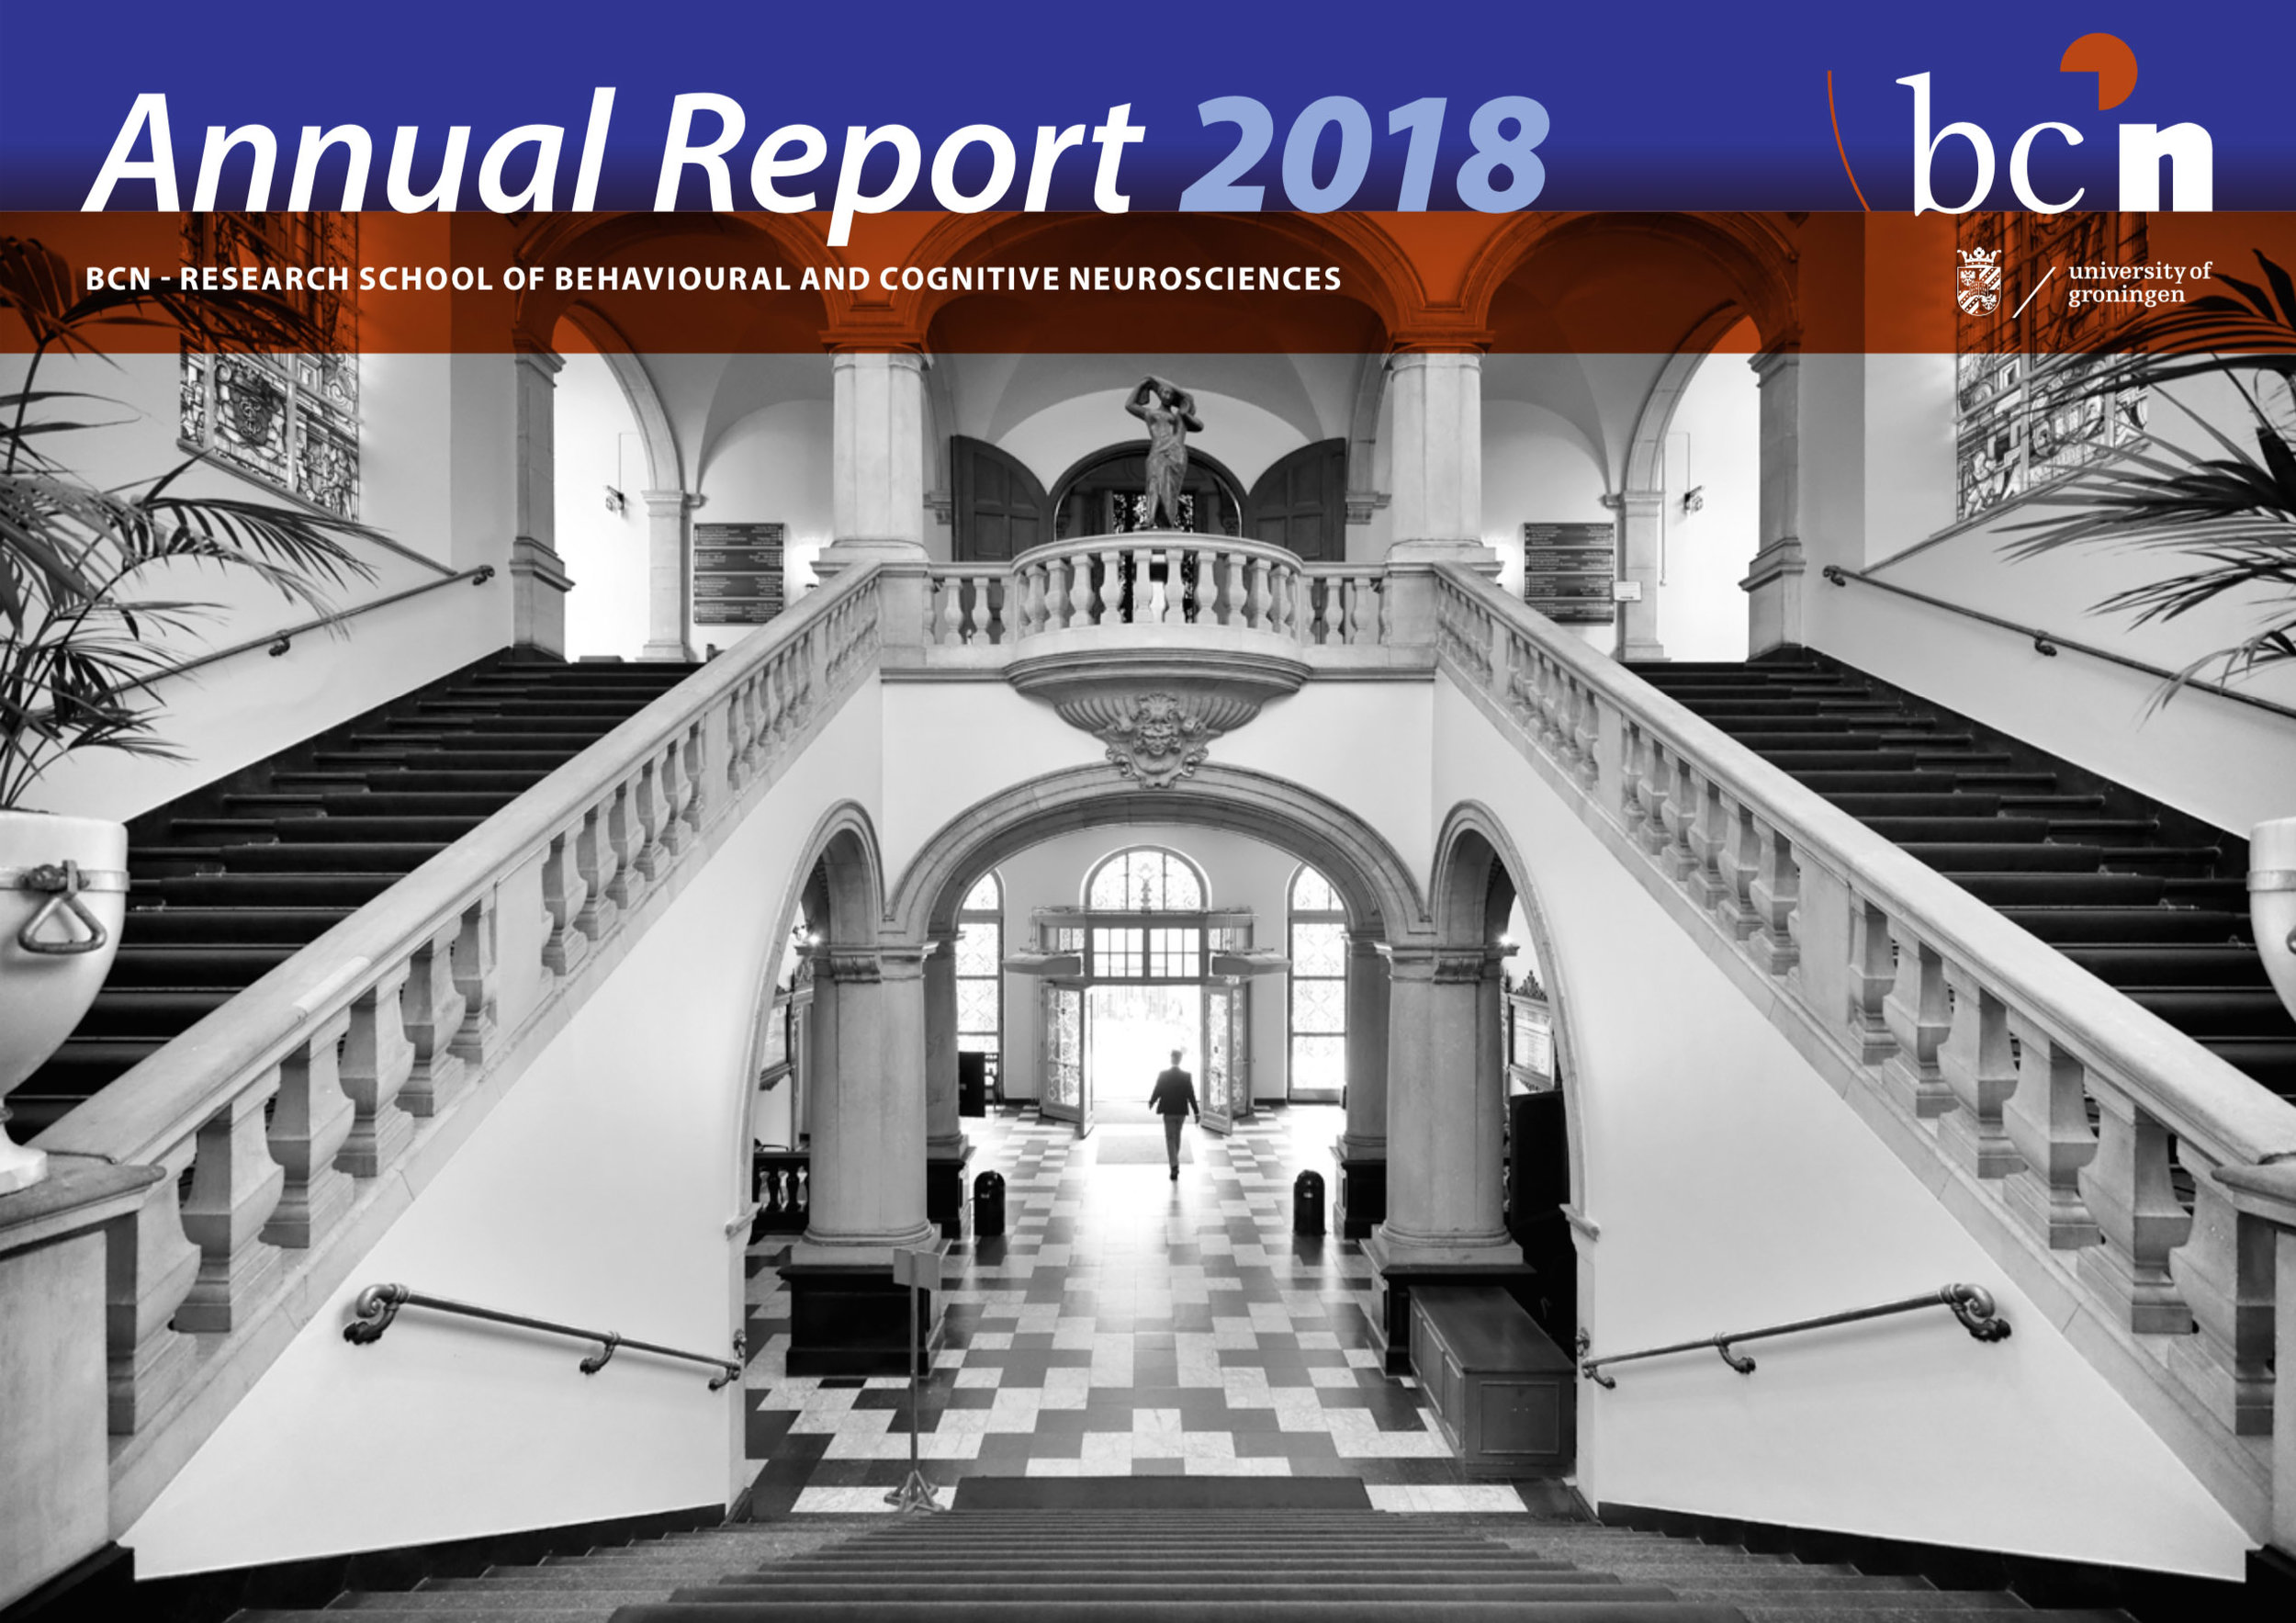 BCN annual report 2018